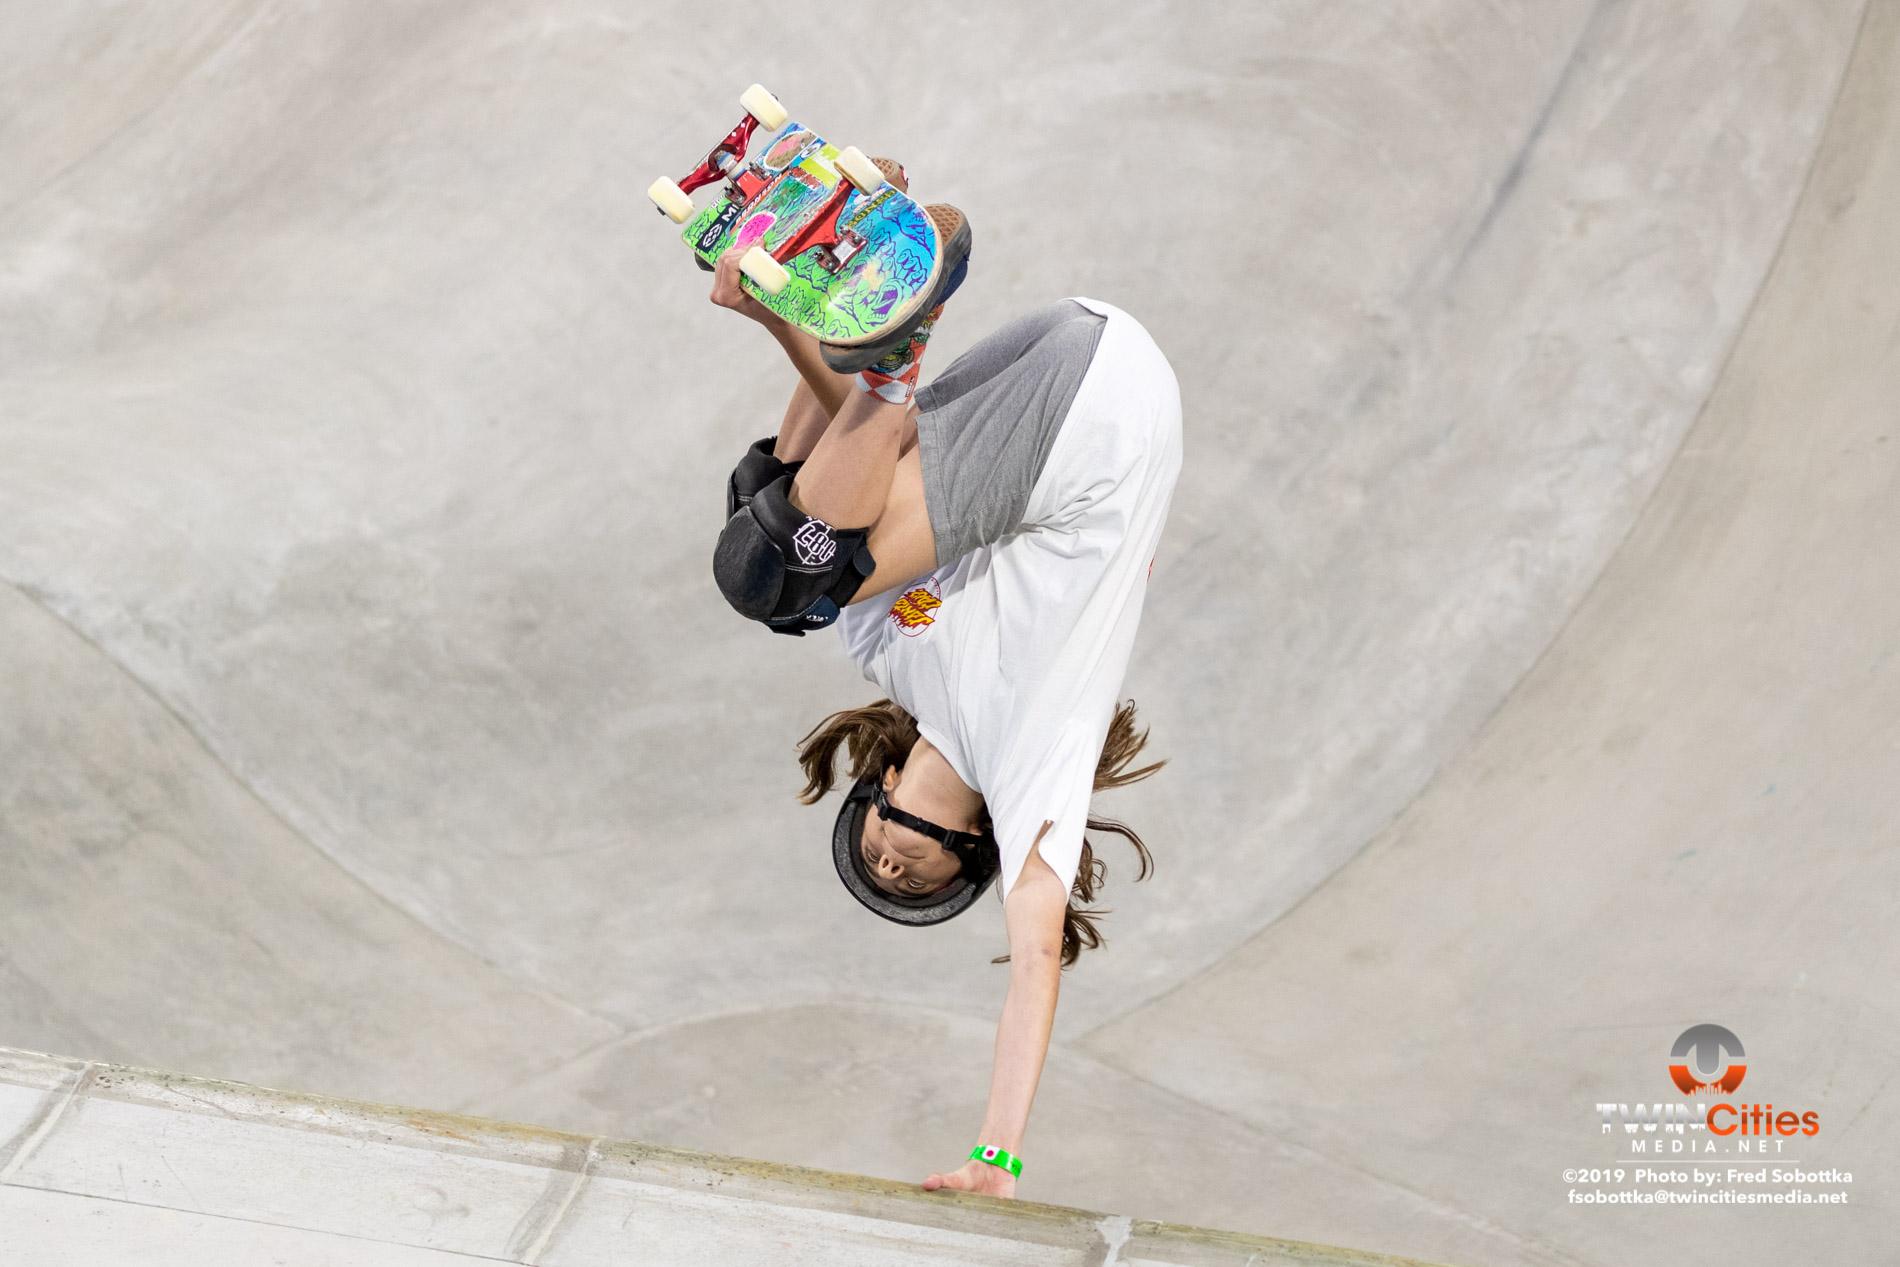 Womens-Skateboard-Park-10